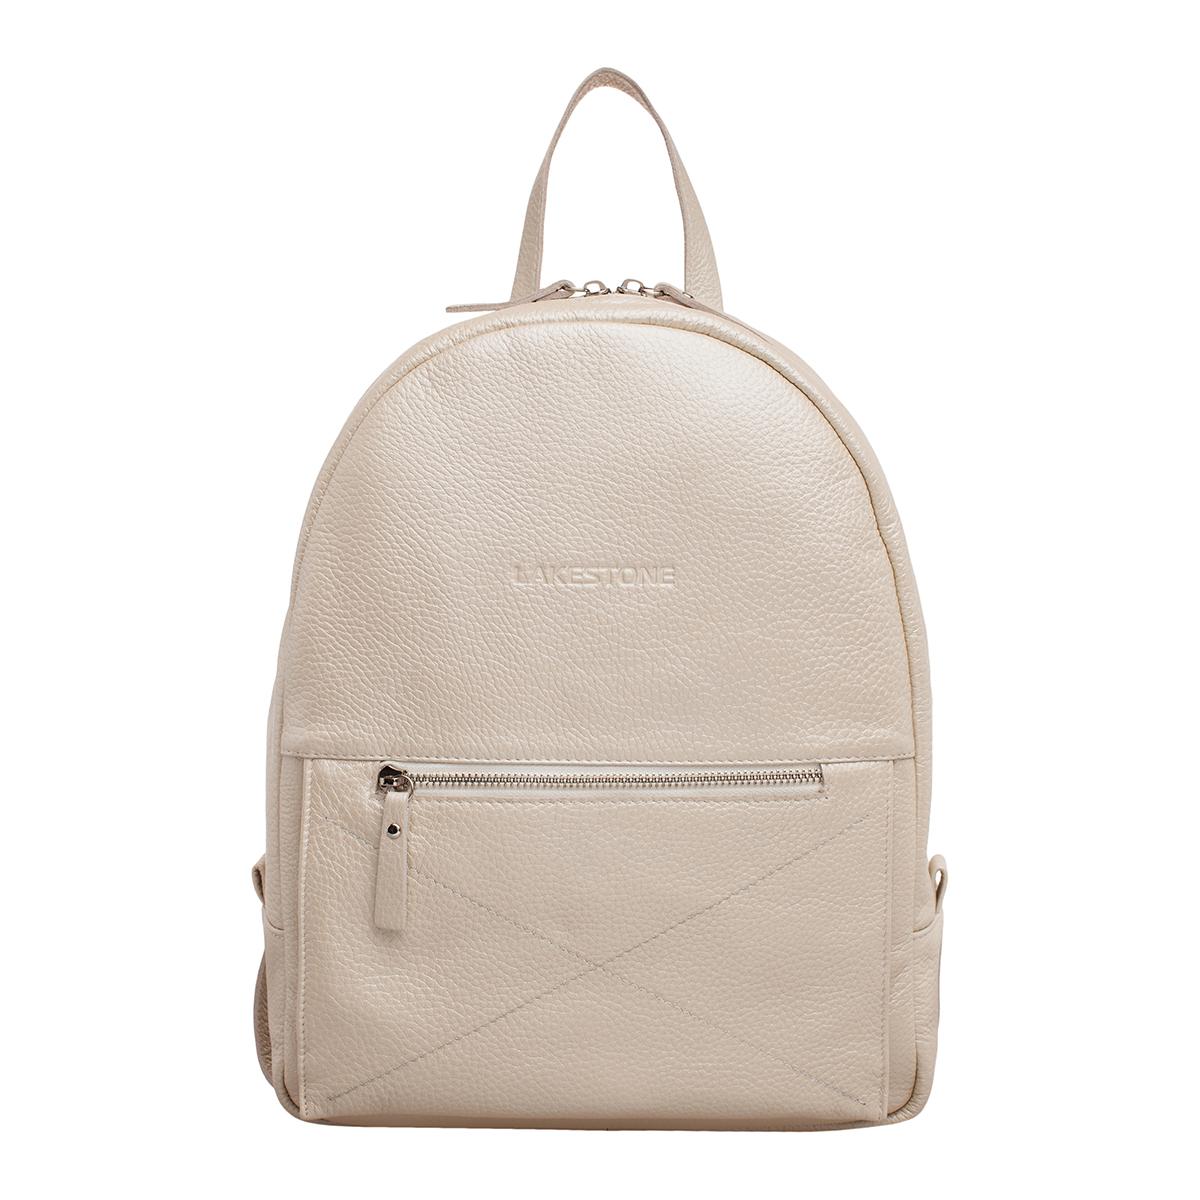 Рюкзак женский кожаный Lakestone 9123917/BG фото